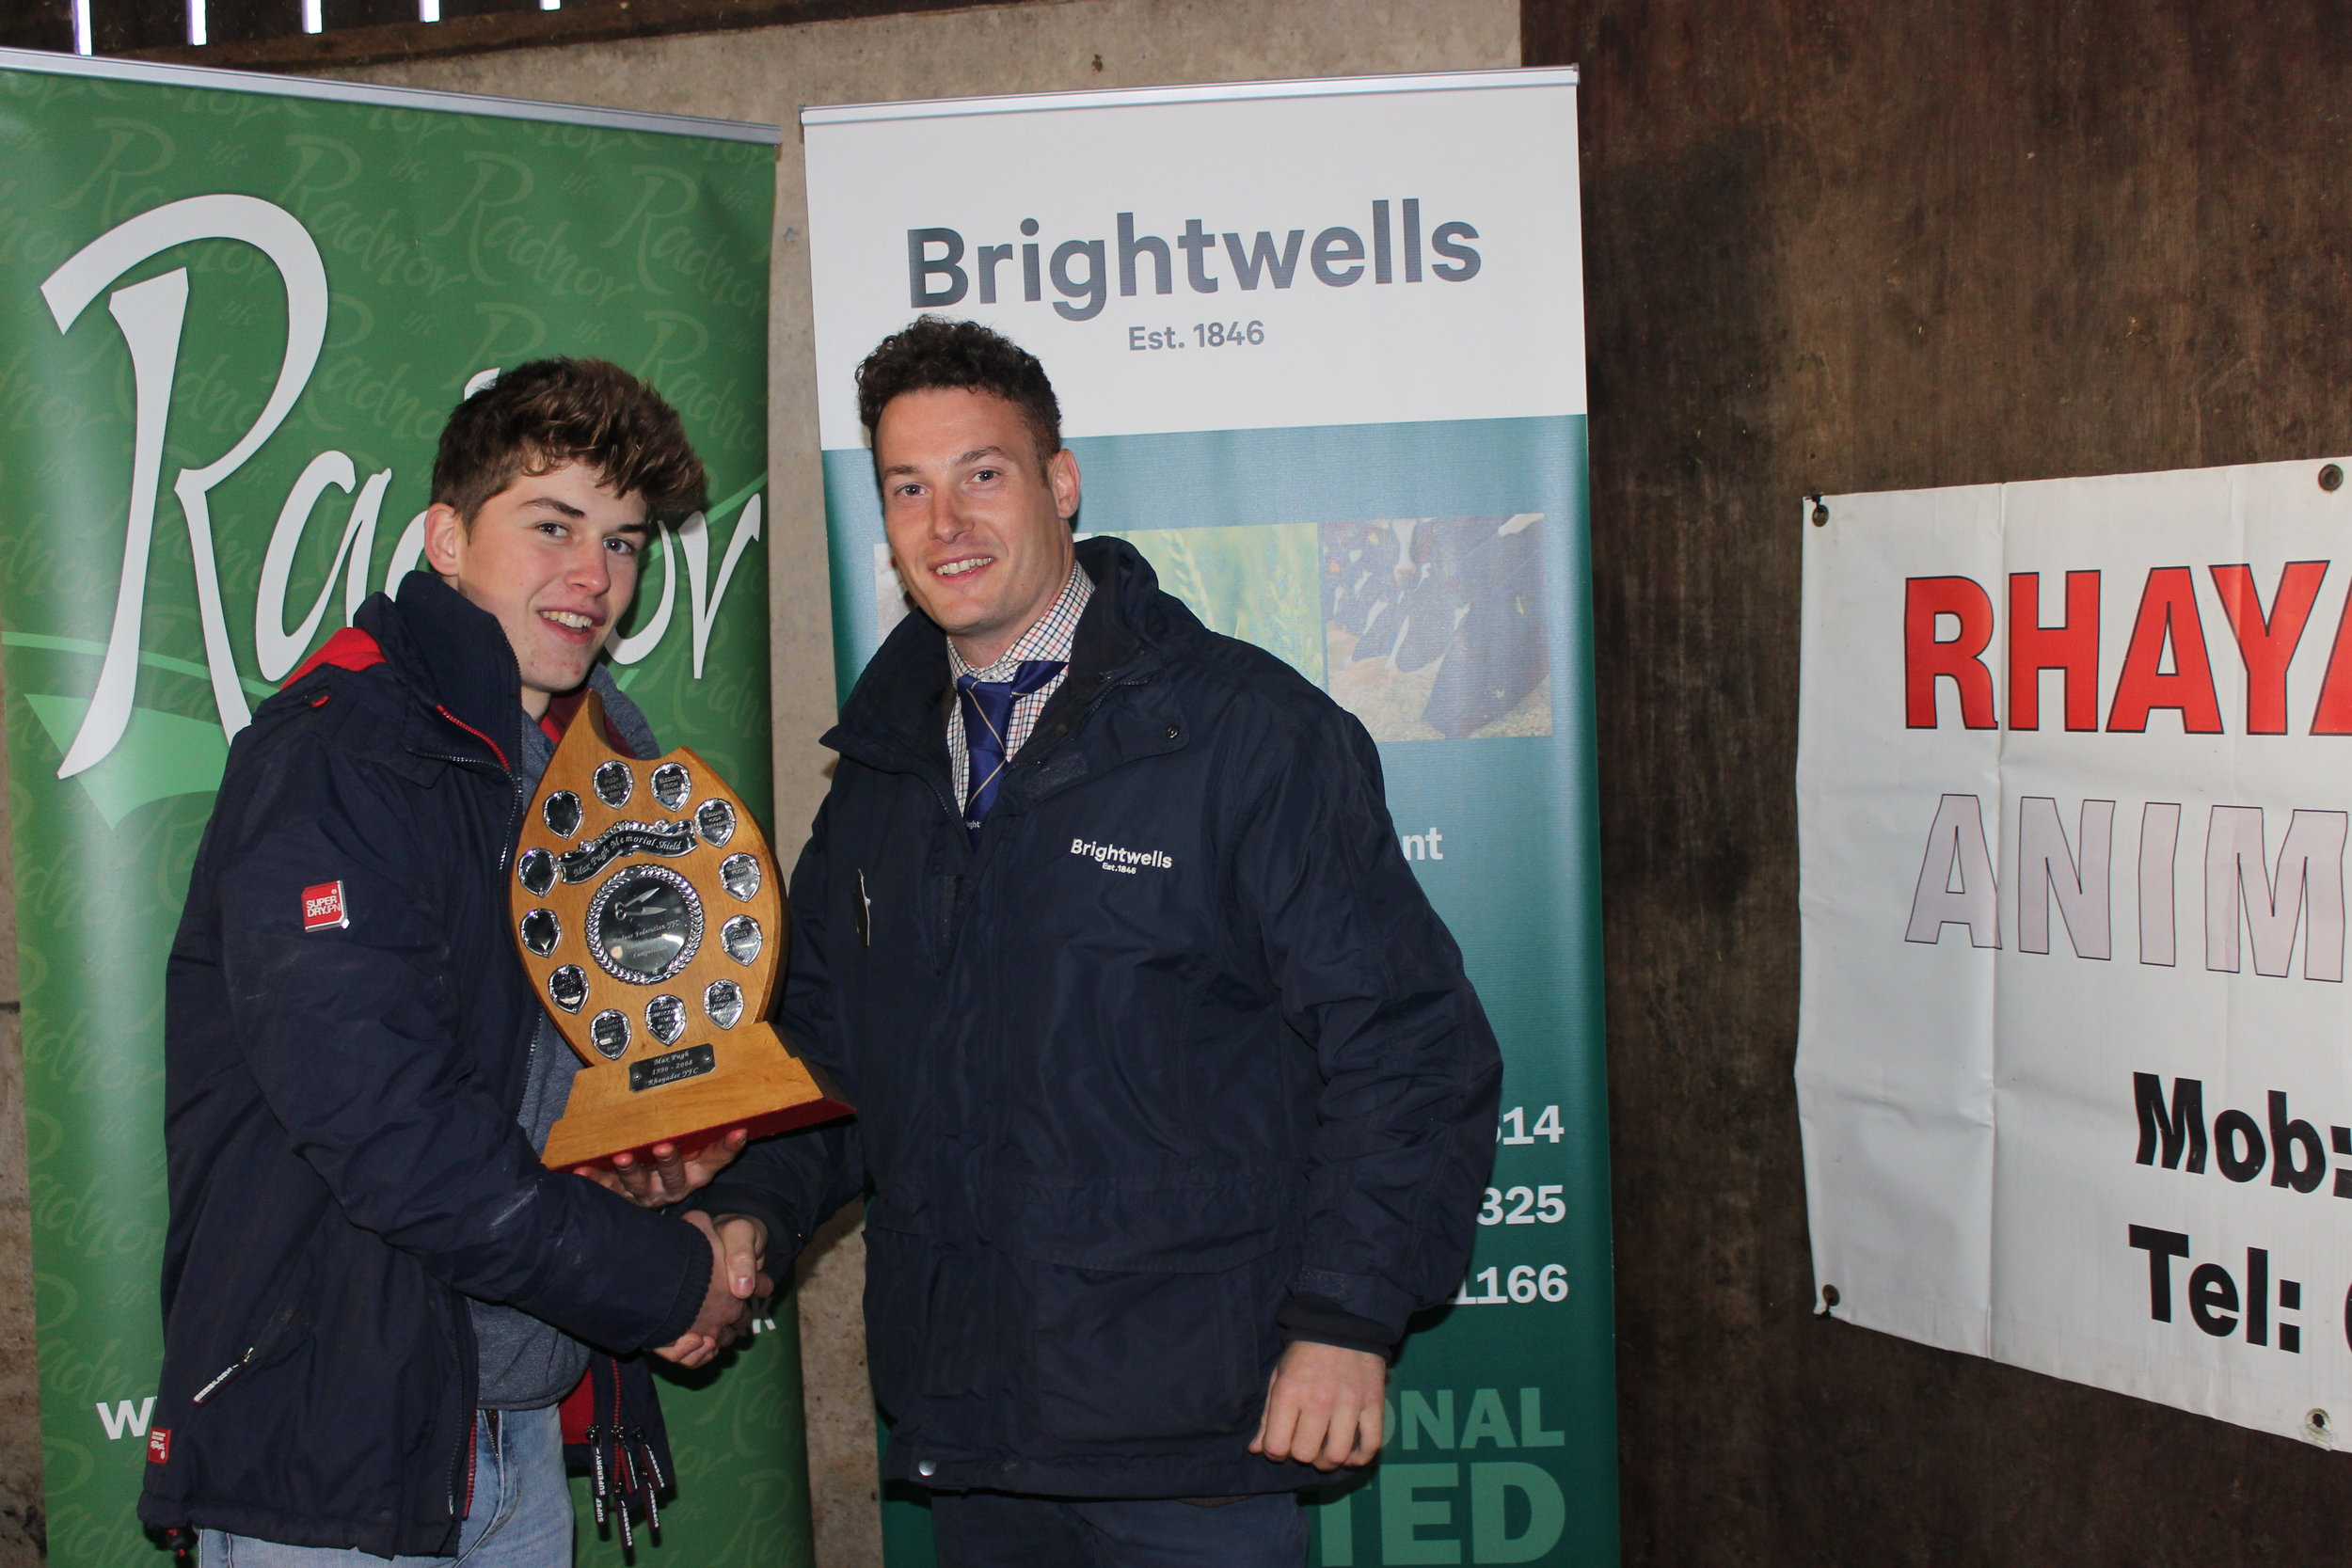 Thomas Swancott, Teme Valley YFC - Max Pugh Memorial Shield (Lamb Trimming) being presented by Matt Williams, Brightwells